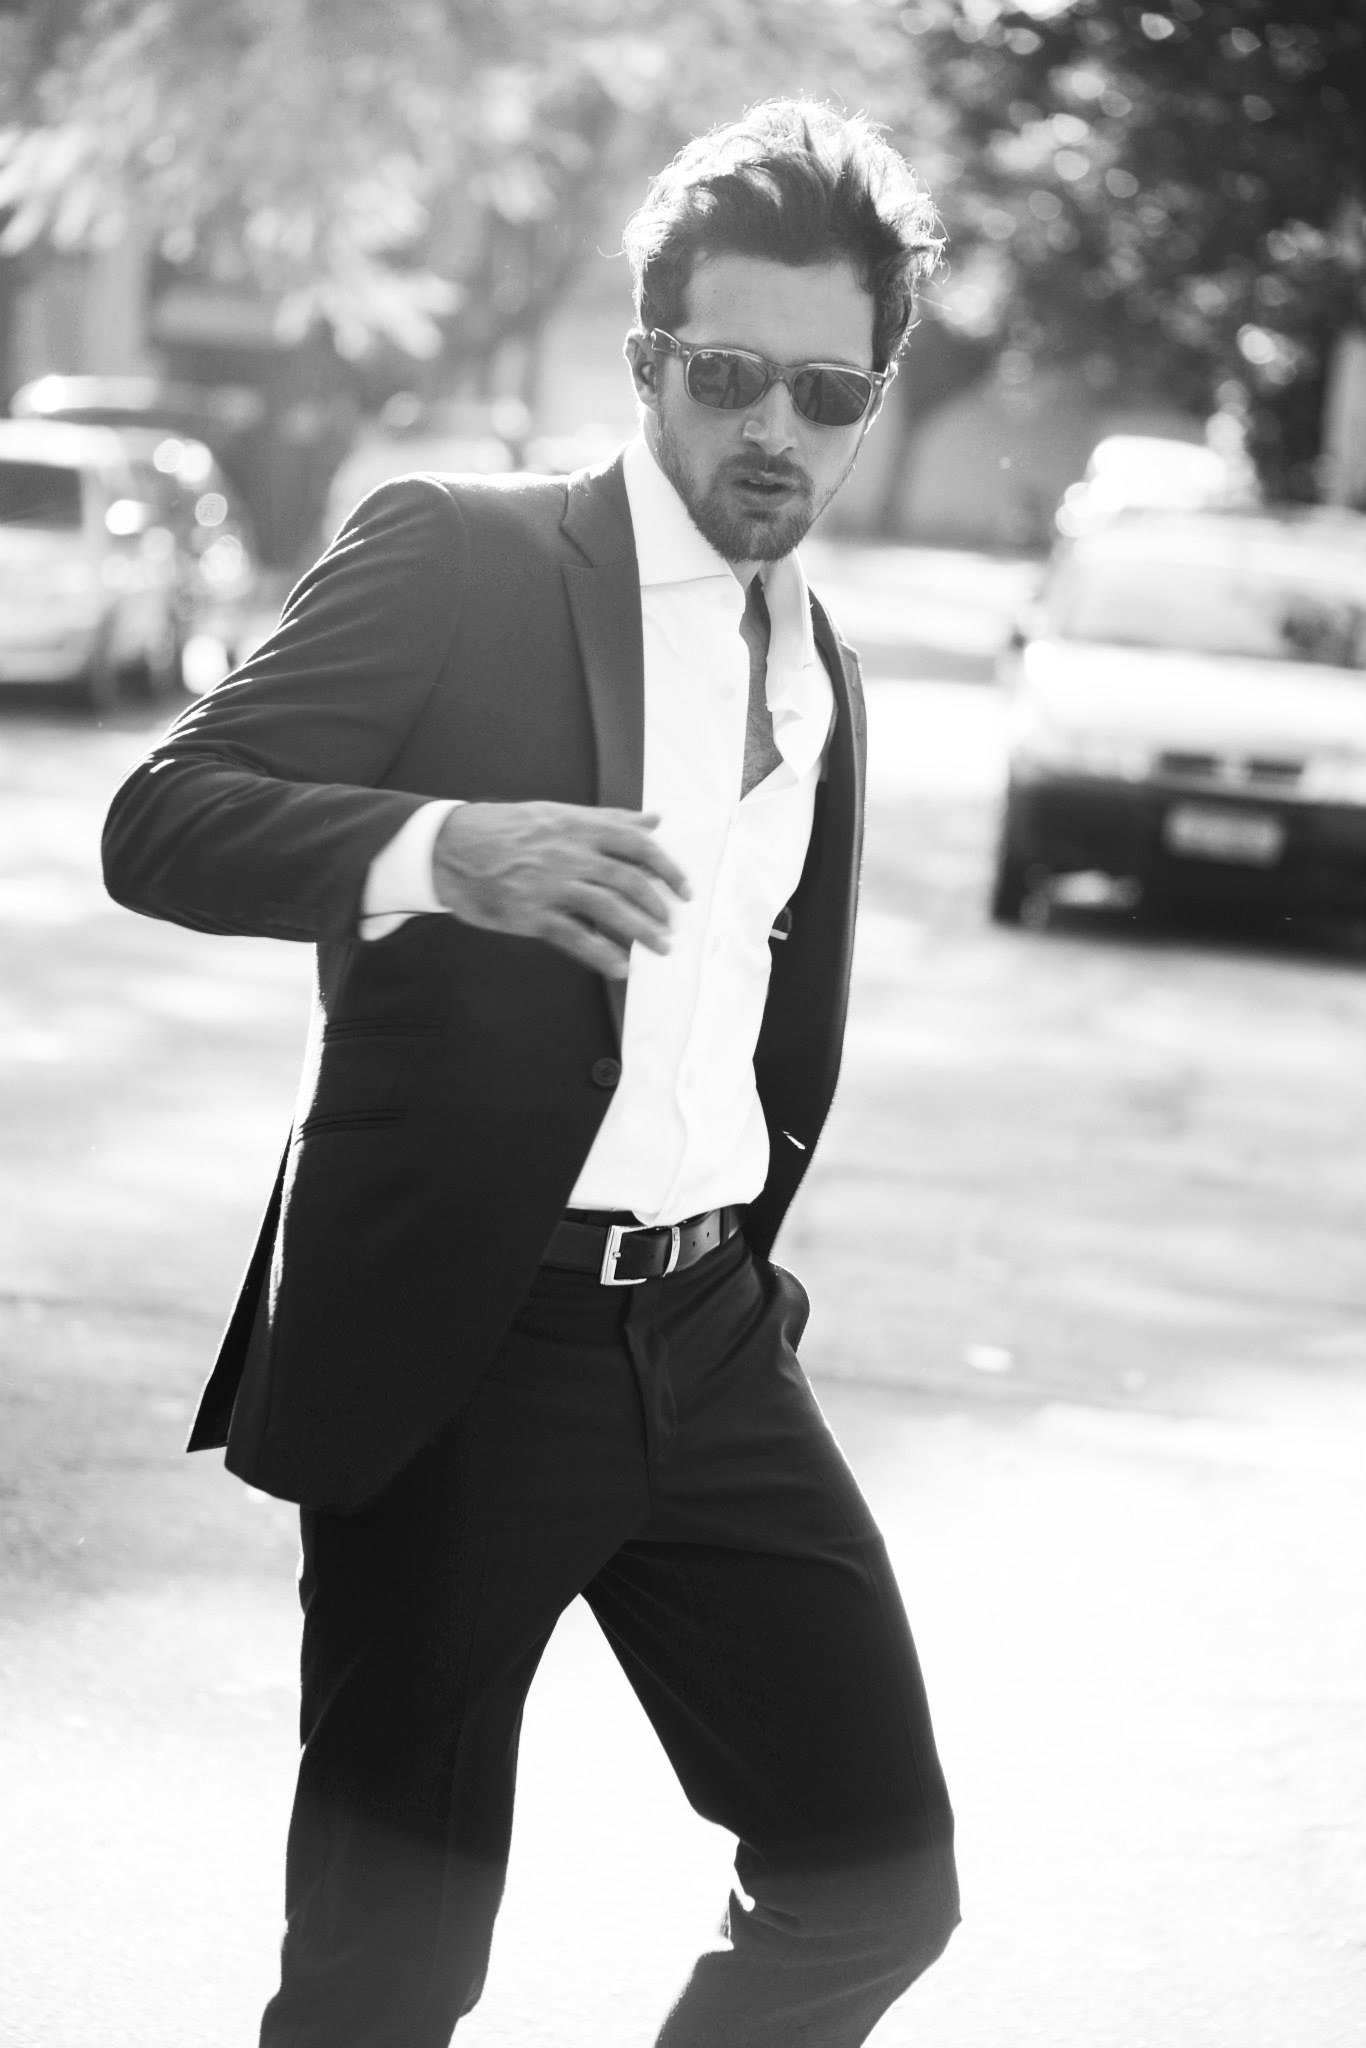 blog de moda masculina, moda masculina, menswear, estilo, style, moda sem censura, alex cursino, rodrigo marconatto, Antonio Bevilacqua, editorial de moda, modelo, way model, 7